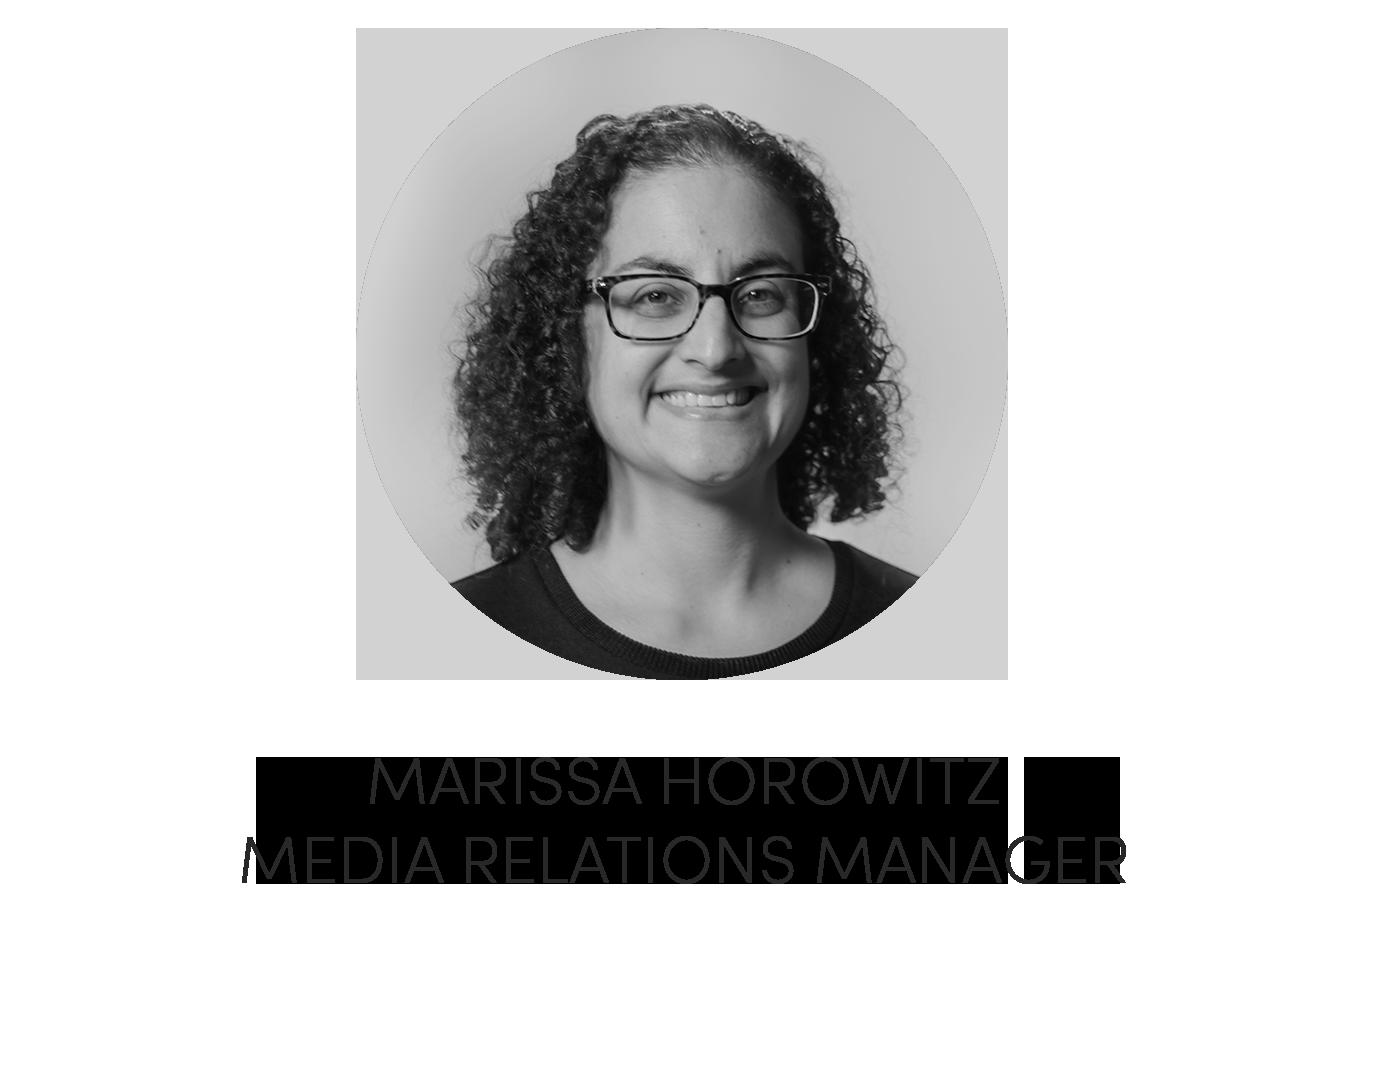 marissa-horowitz